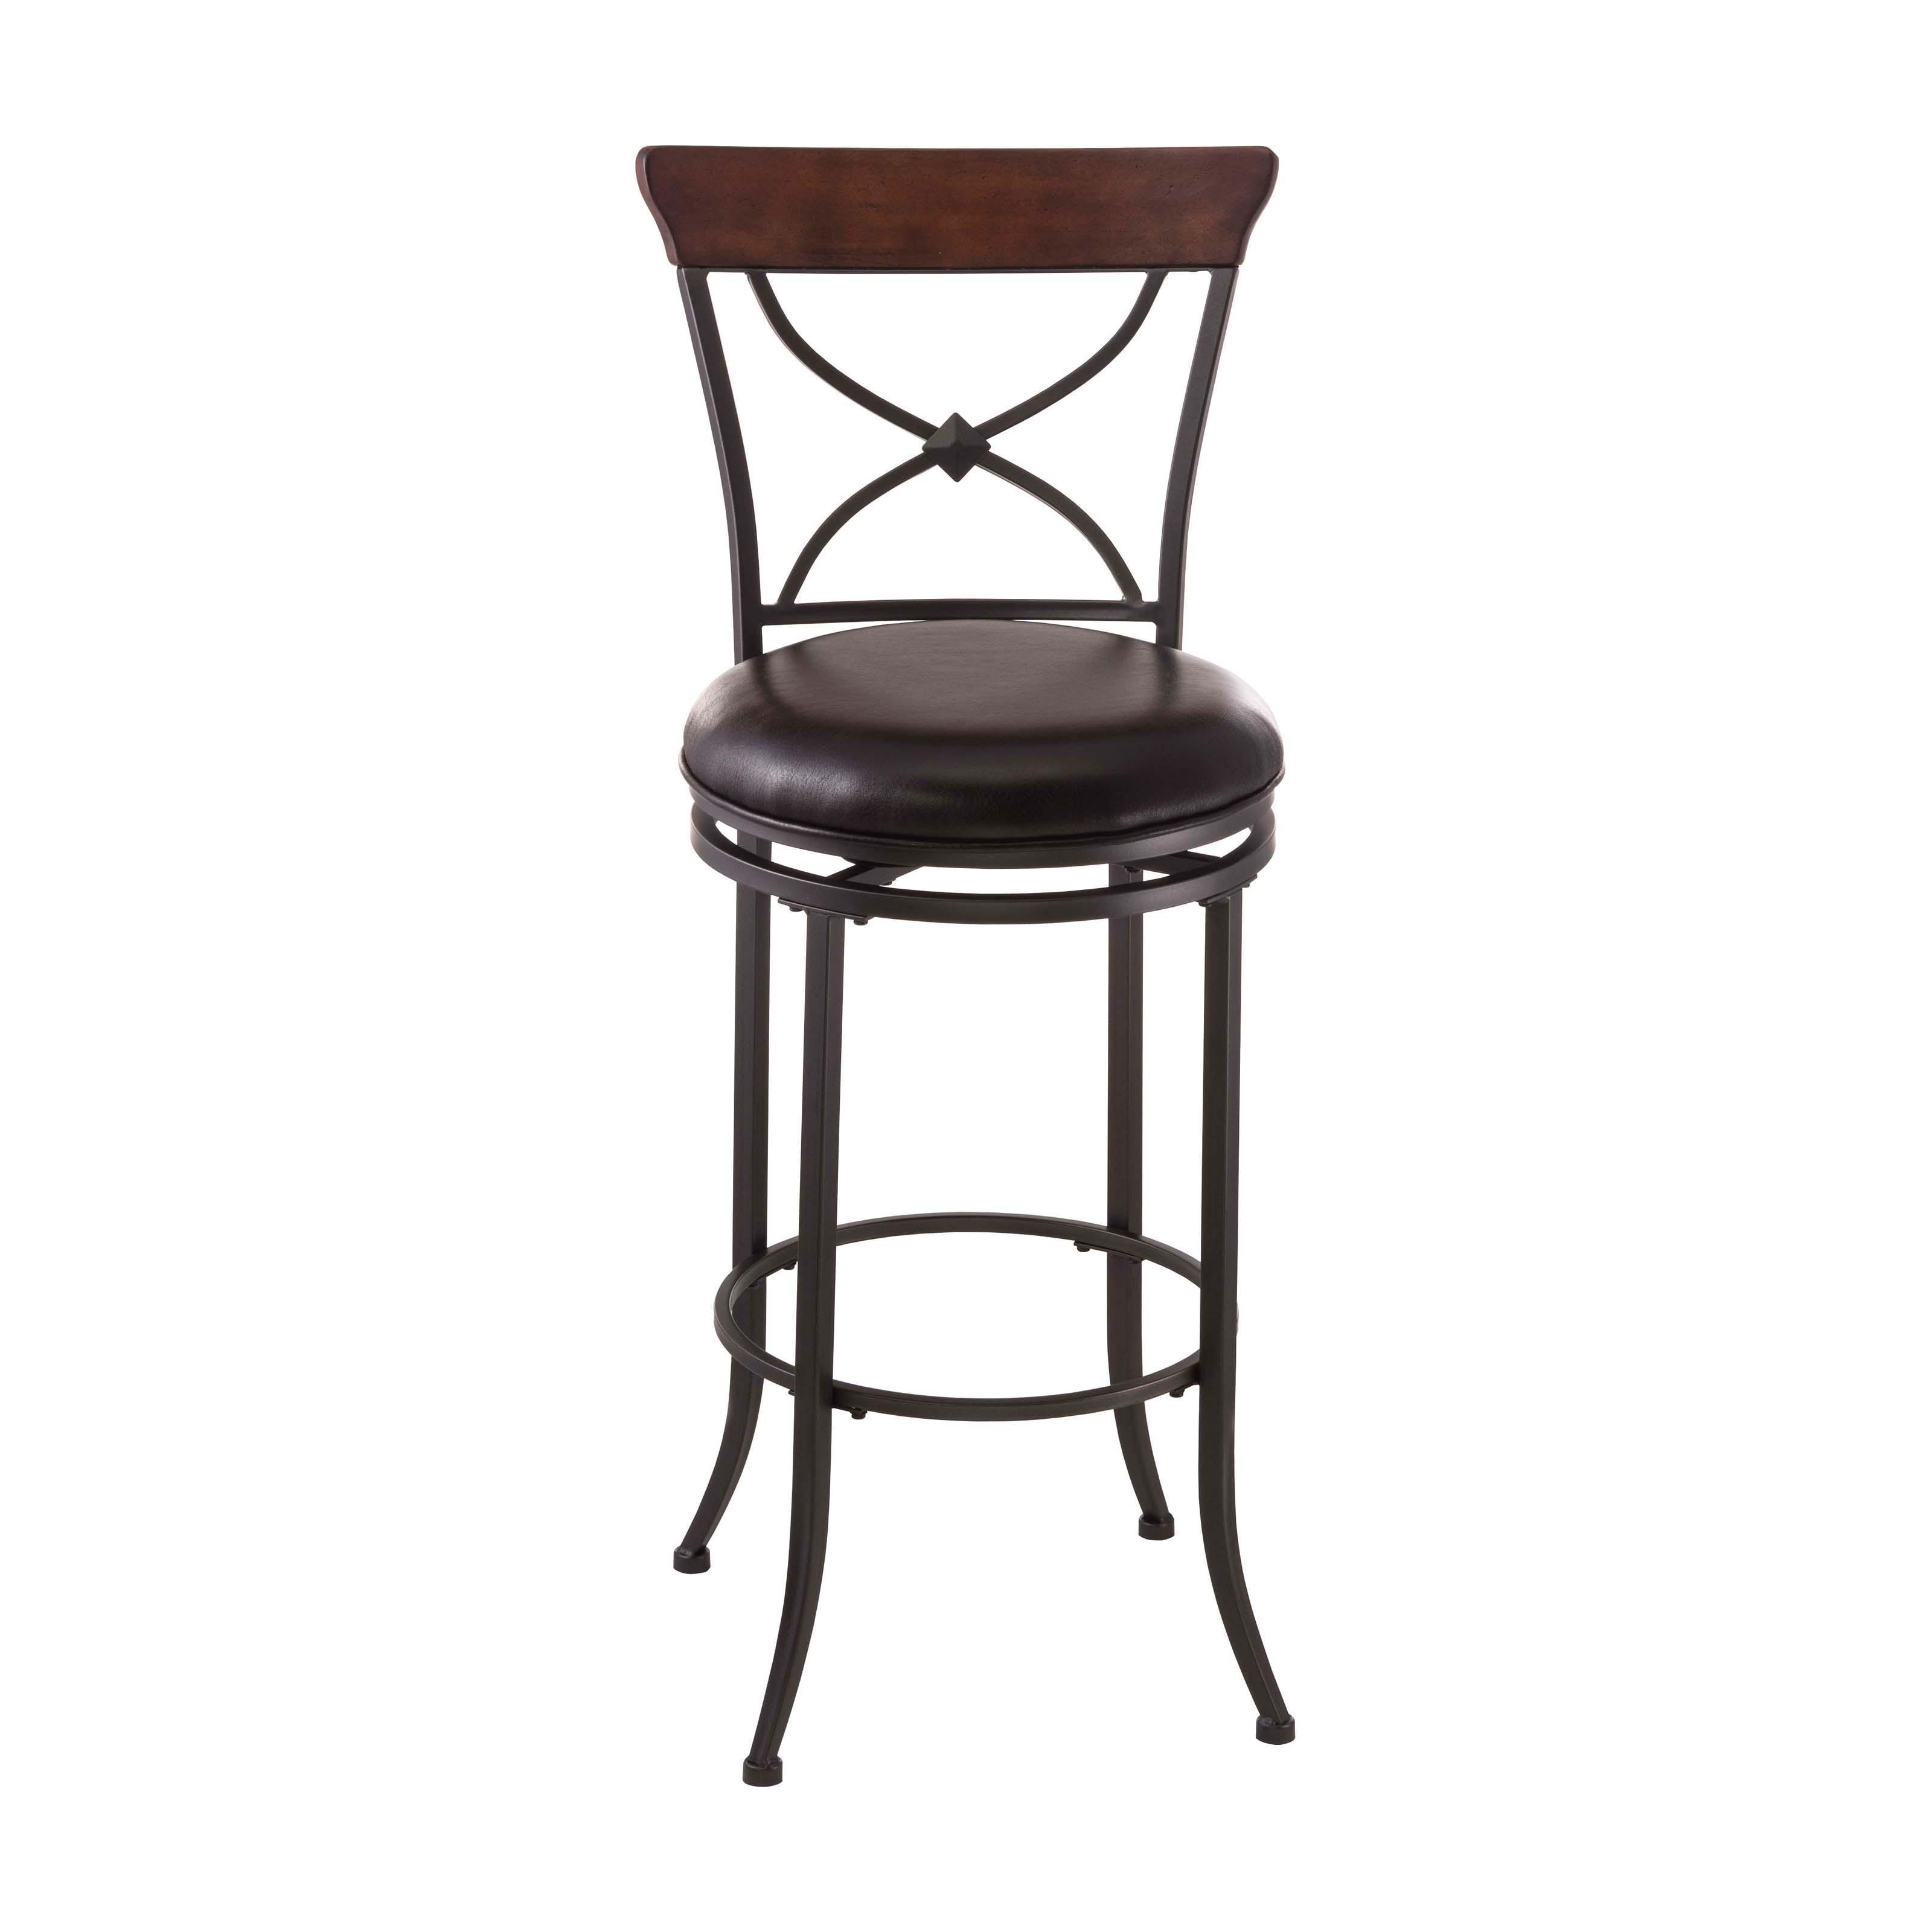 Brilliant Bar Stool Burda Kitchen Counter Breakfast Stool Padded Faux Ibusinesslaw Wood Chair Design Ideas Ibusinesslaworg